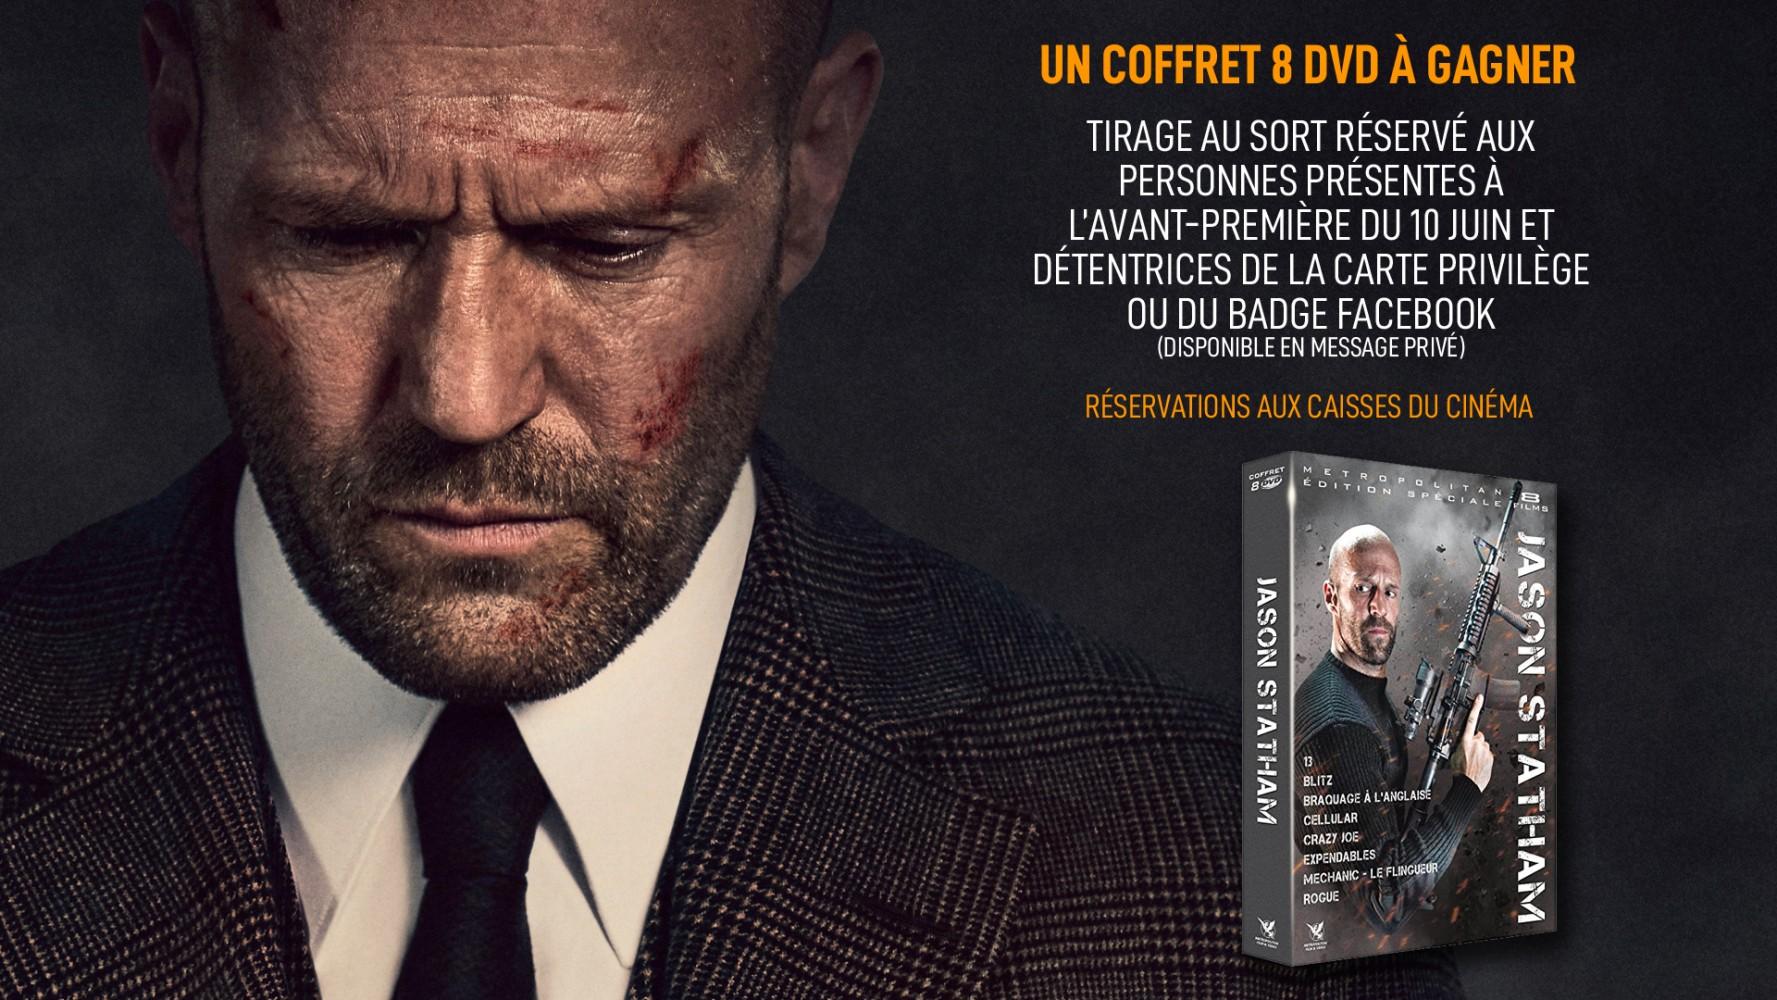 [JEU] Coffret 8 DVD Jason Statham à gagner !